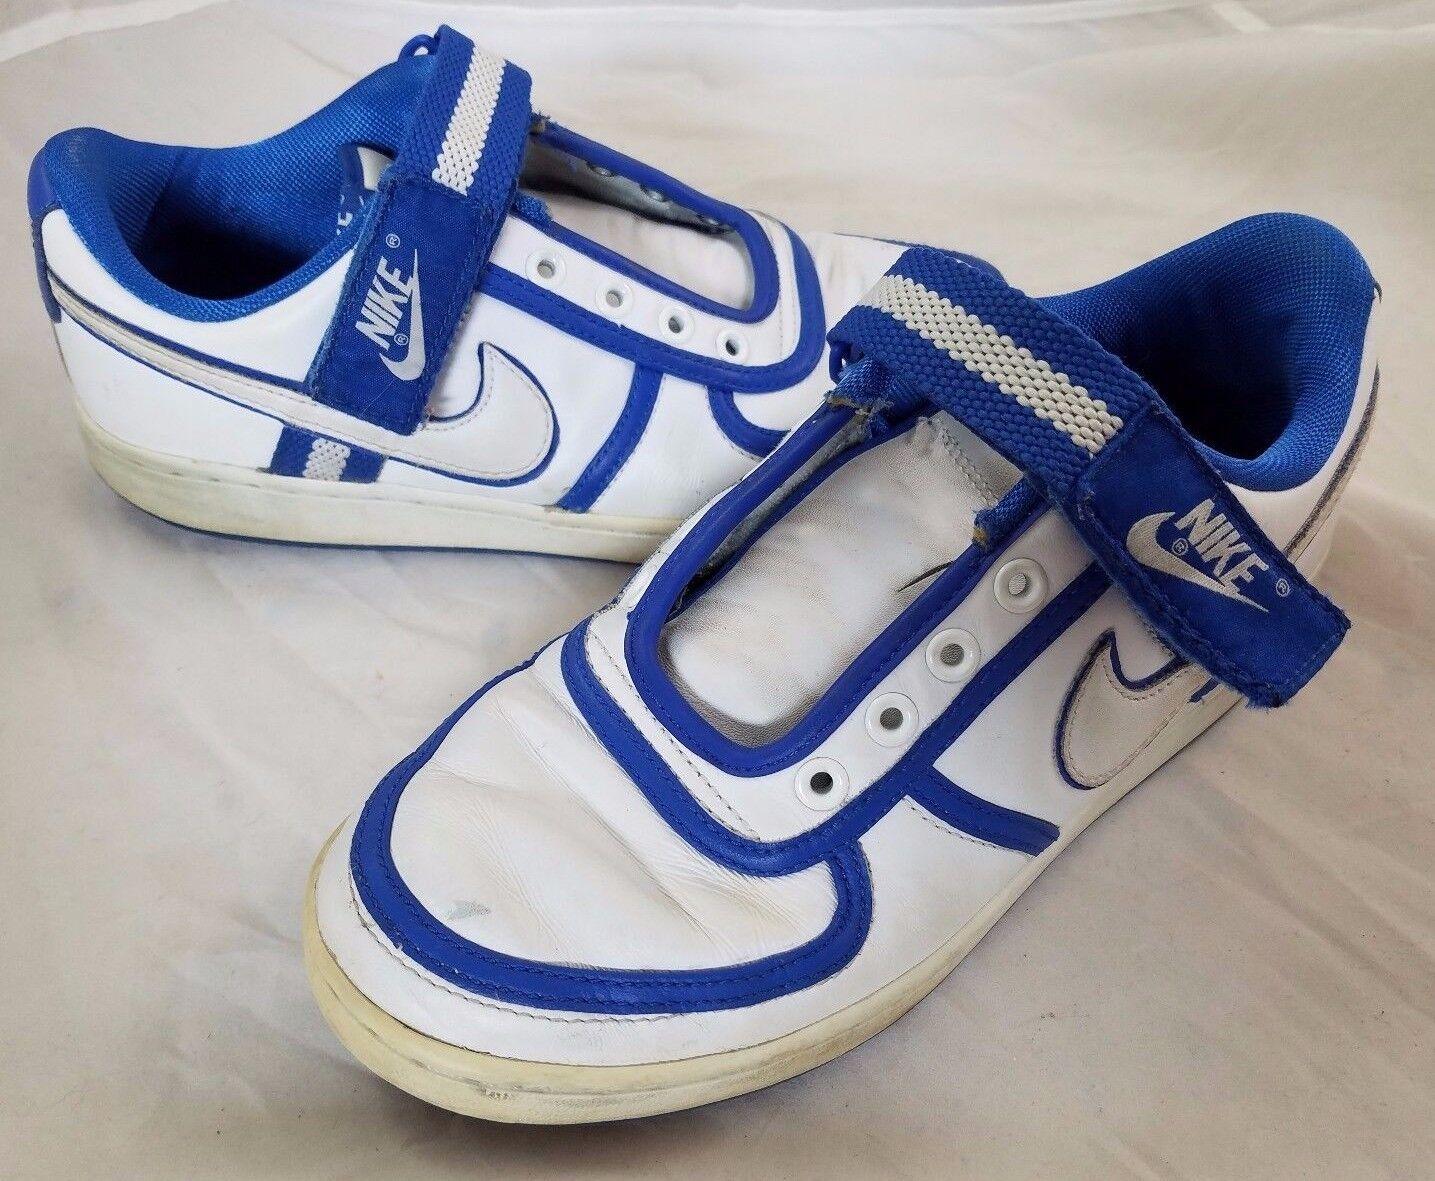 Nike Vandal Low Varsity Blue Basketball Sneakers Shoes Mens 7.5 316432-111 White